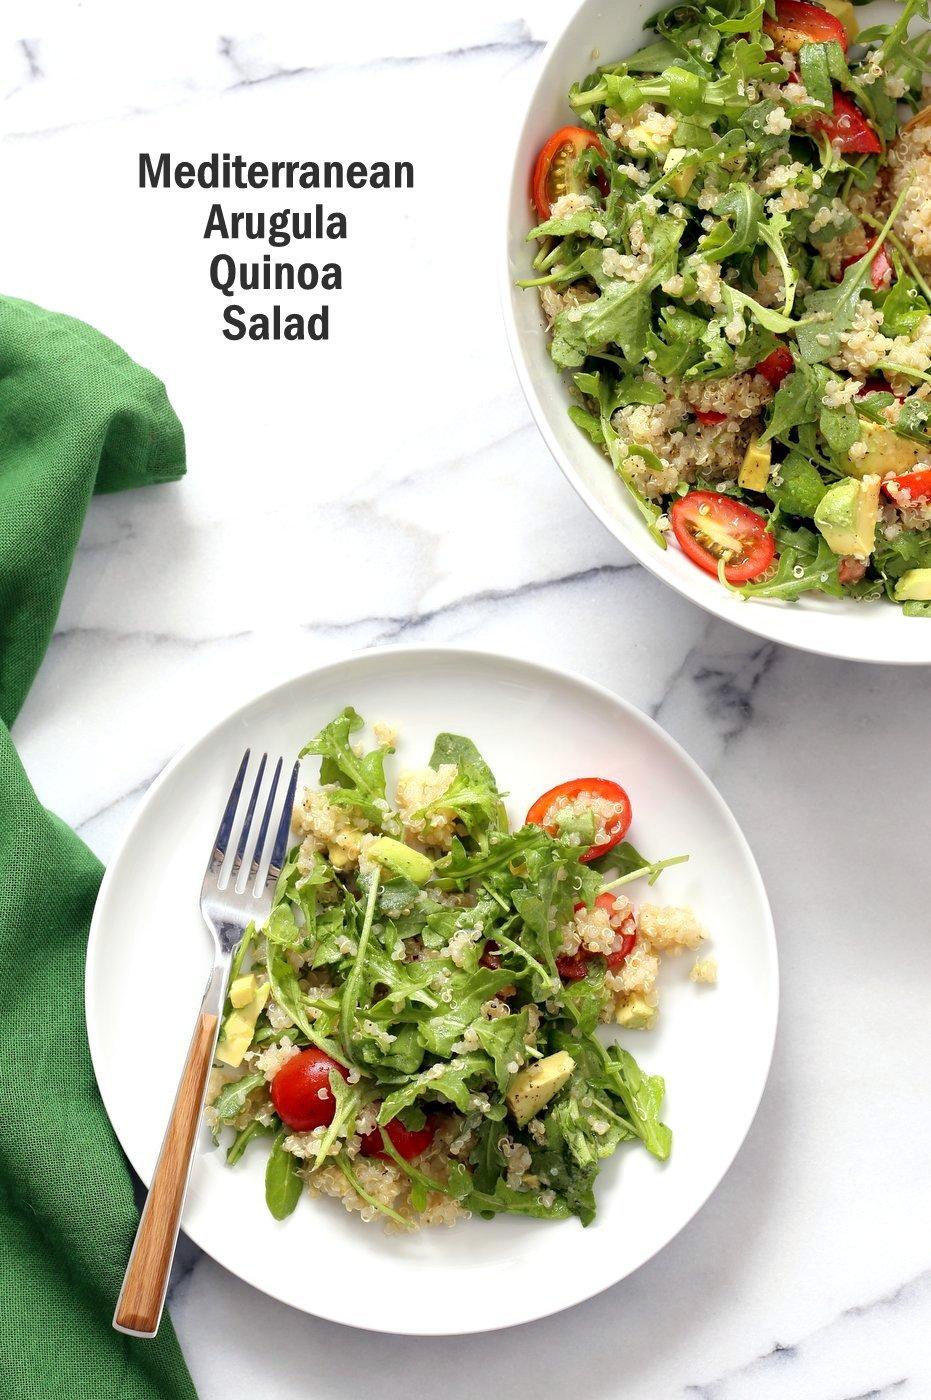 Mediterranean Quinoa Salad With Arugula Avocado Vegan Richa